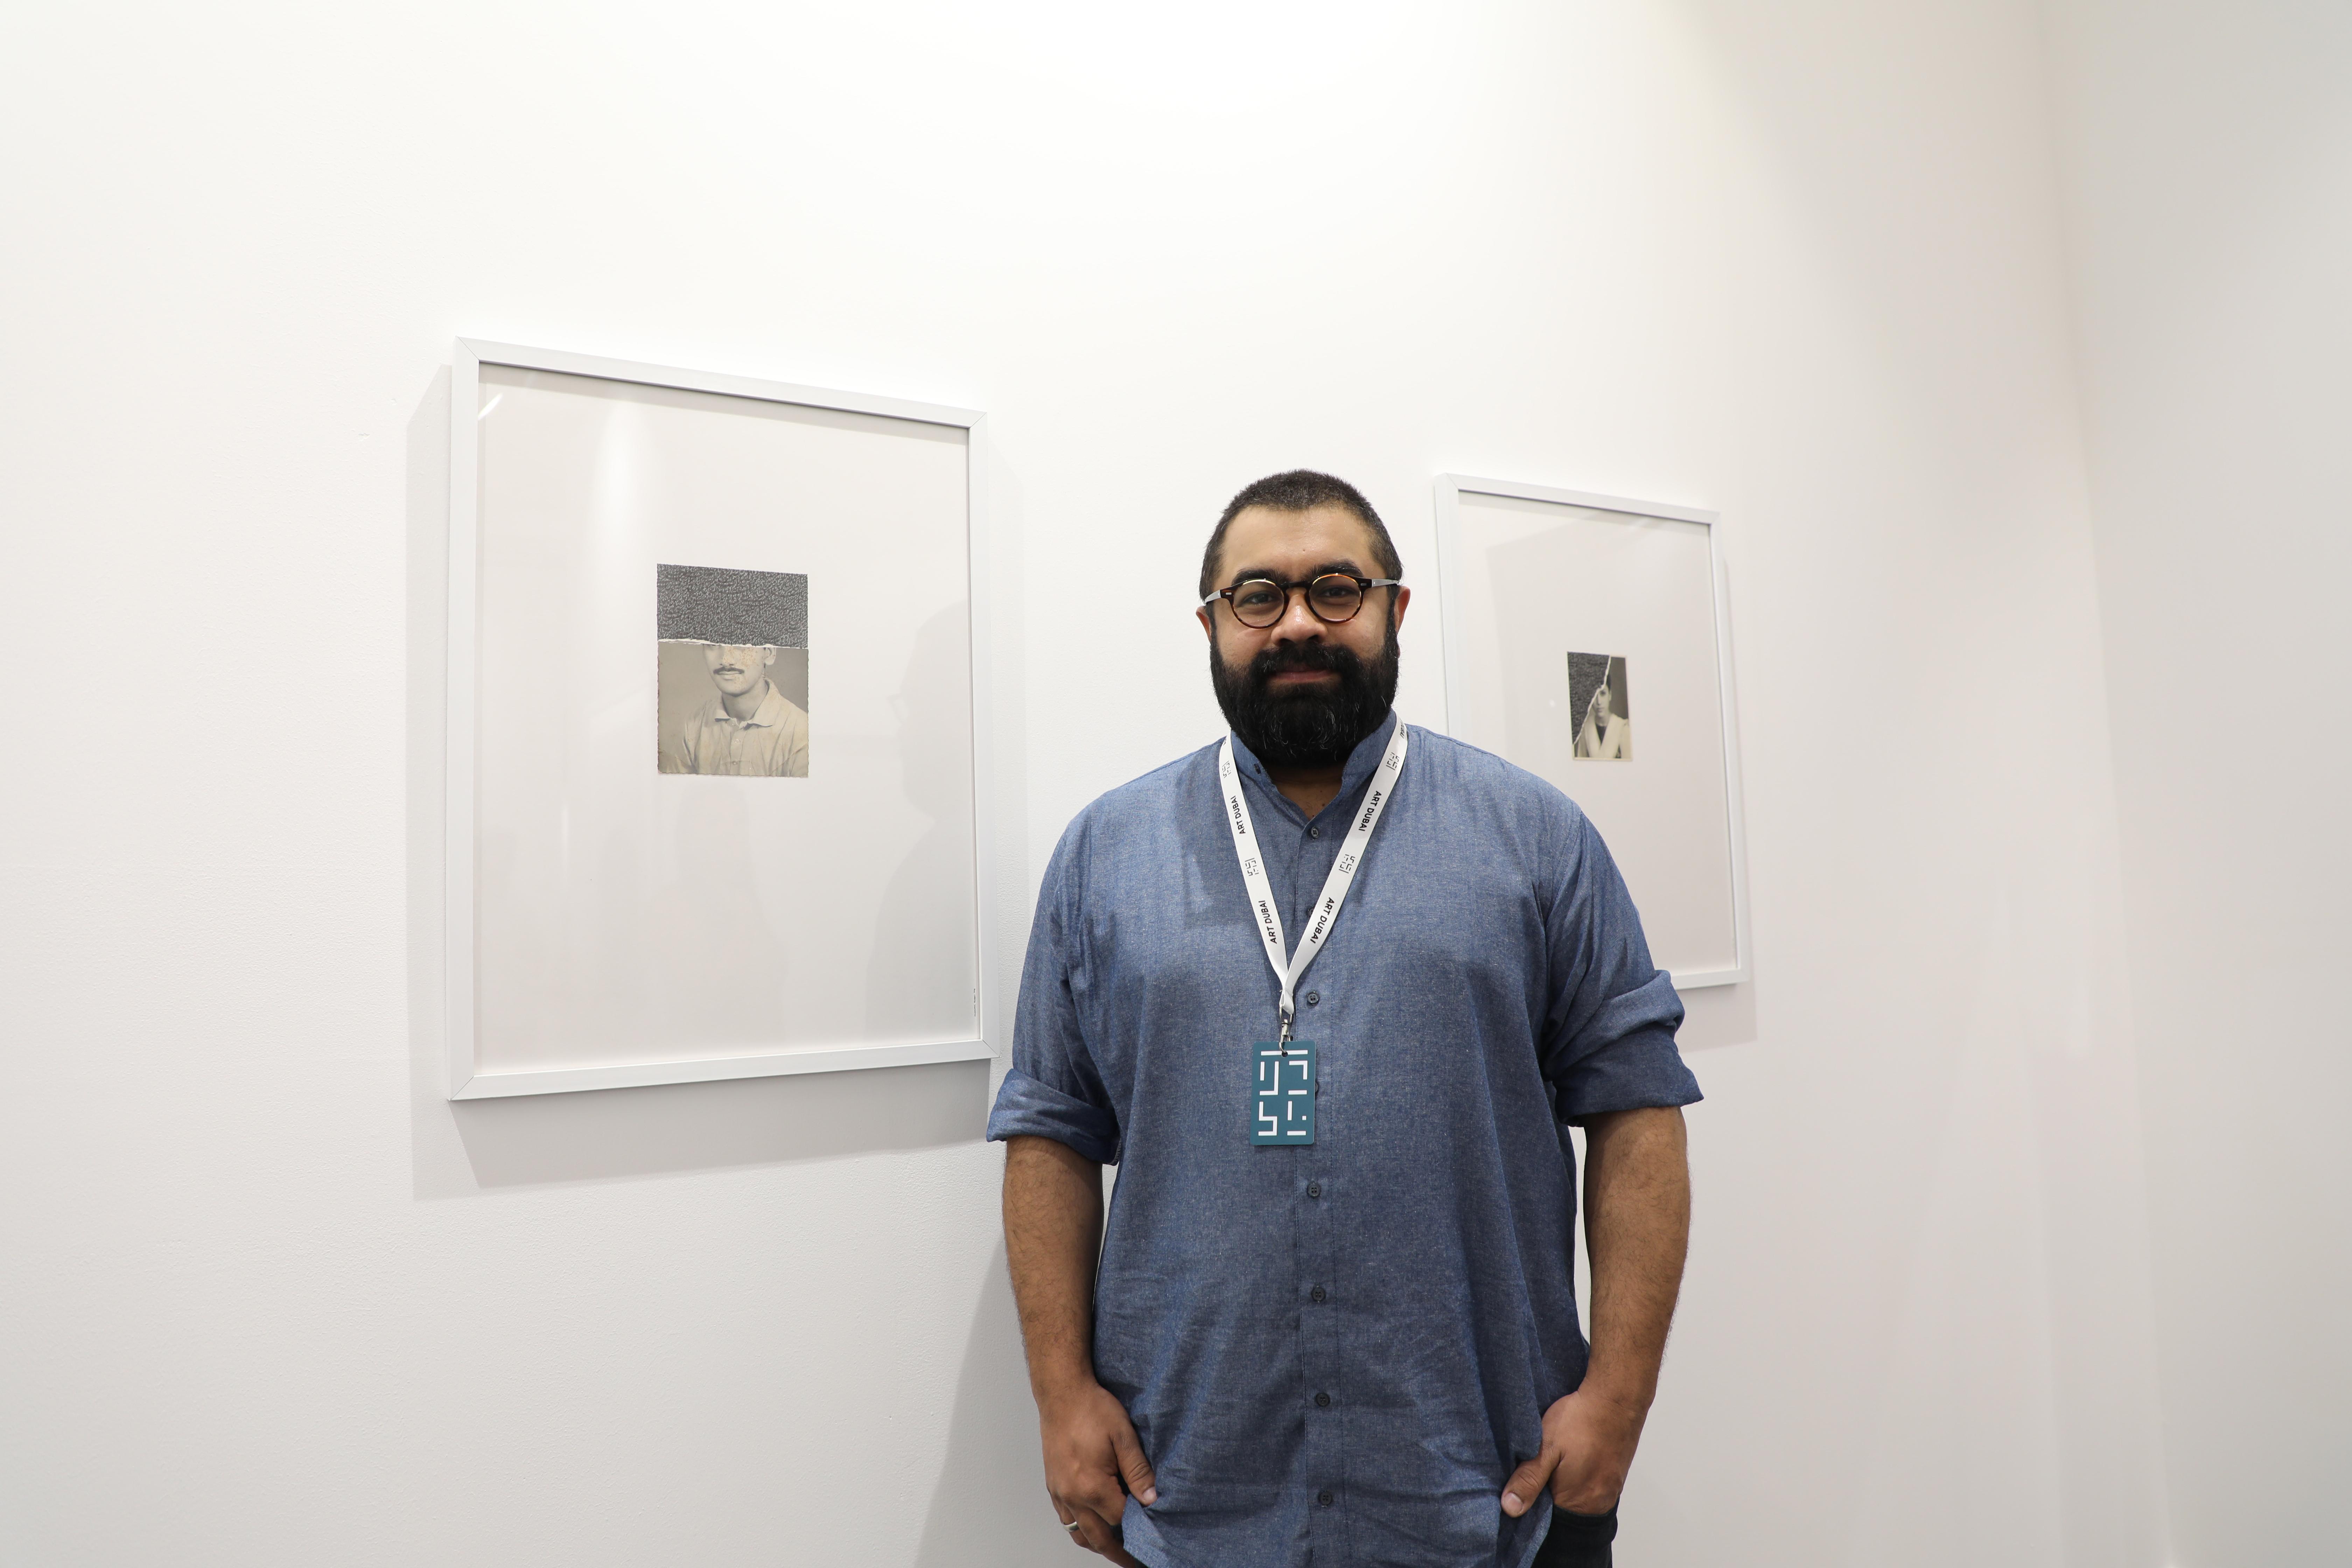 Muzzamil Raheel